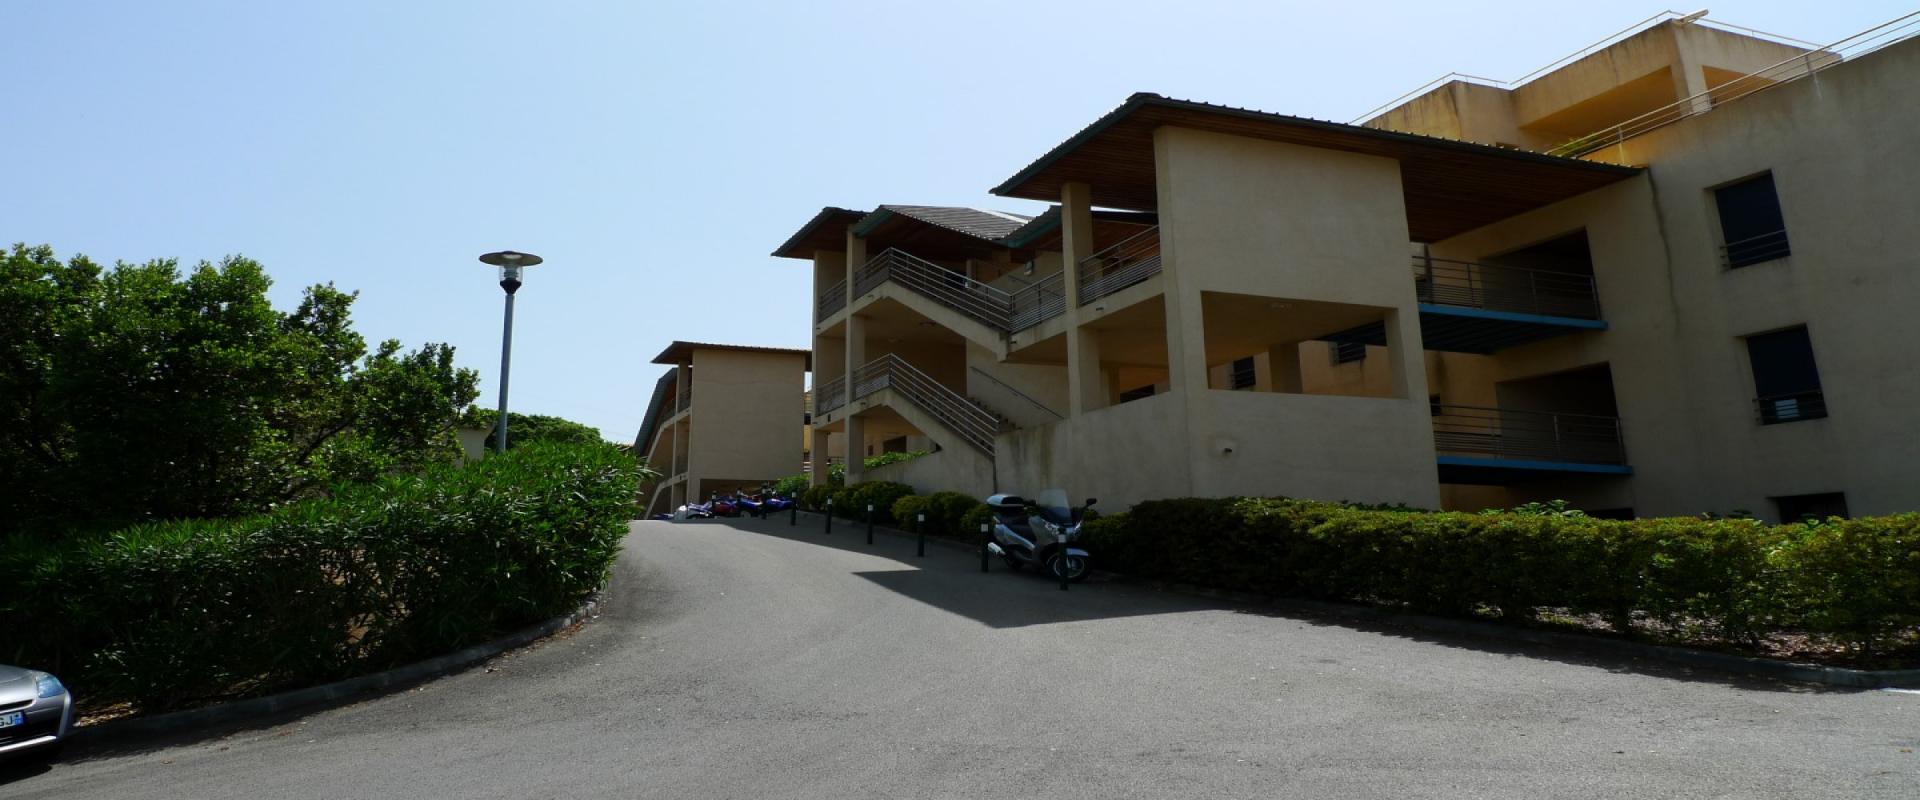 F3 STILETTO résidence